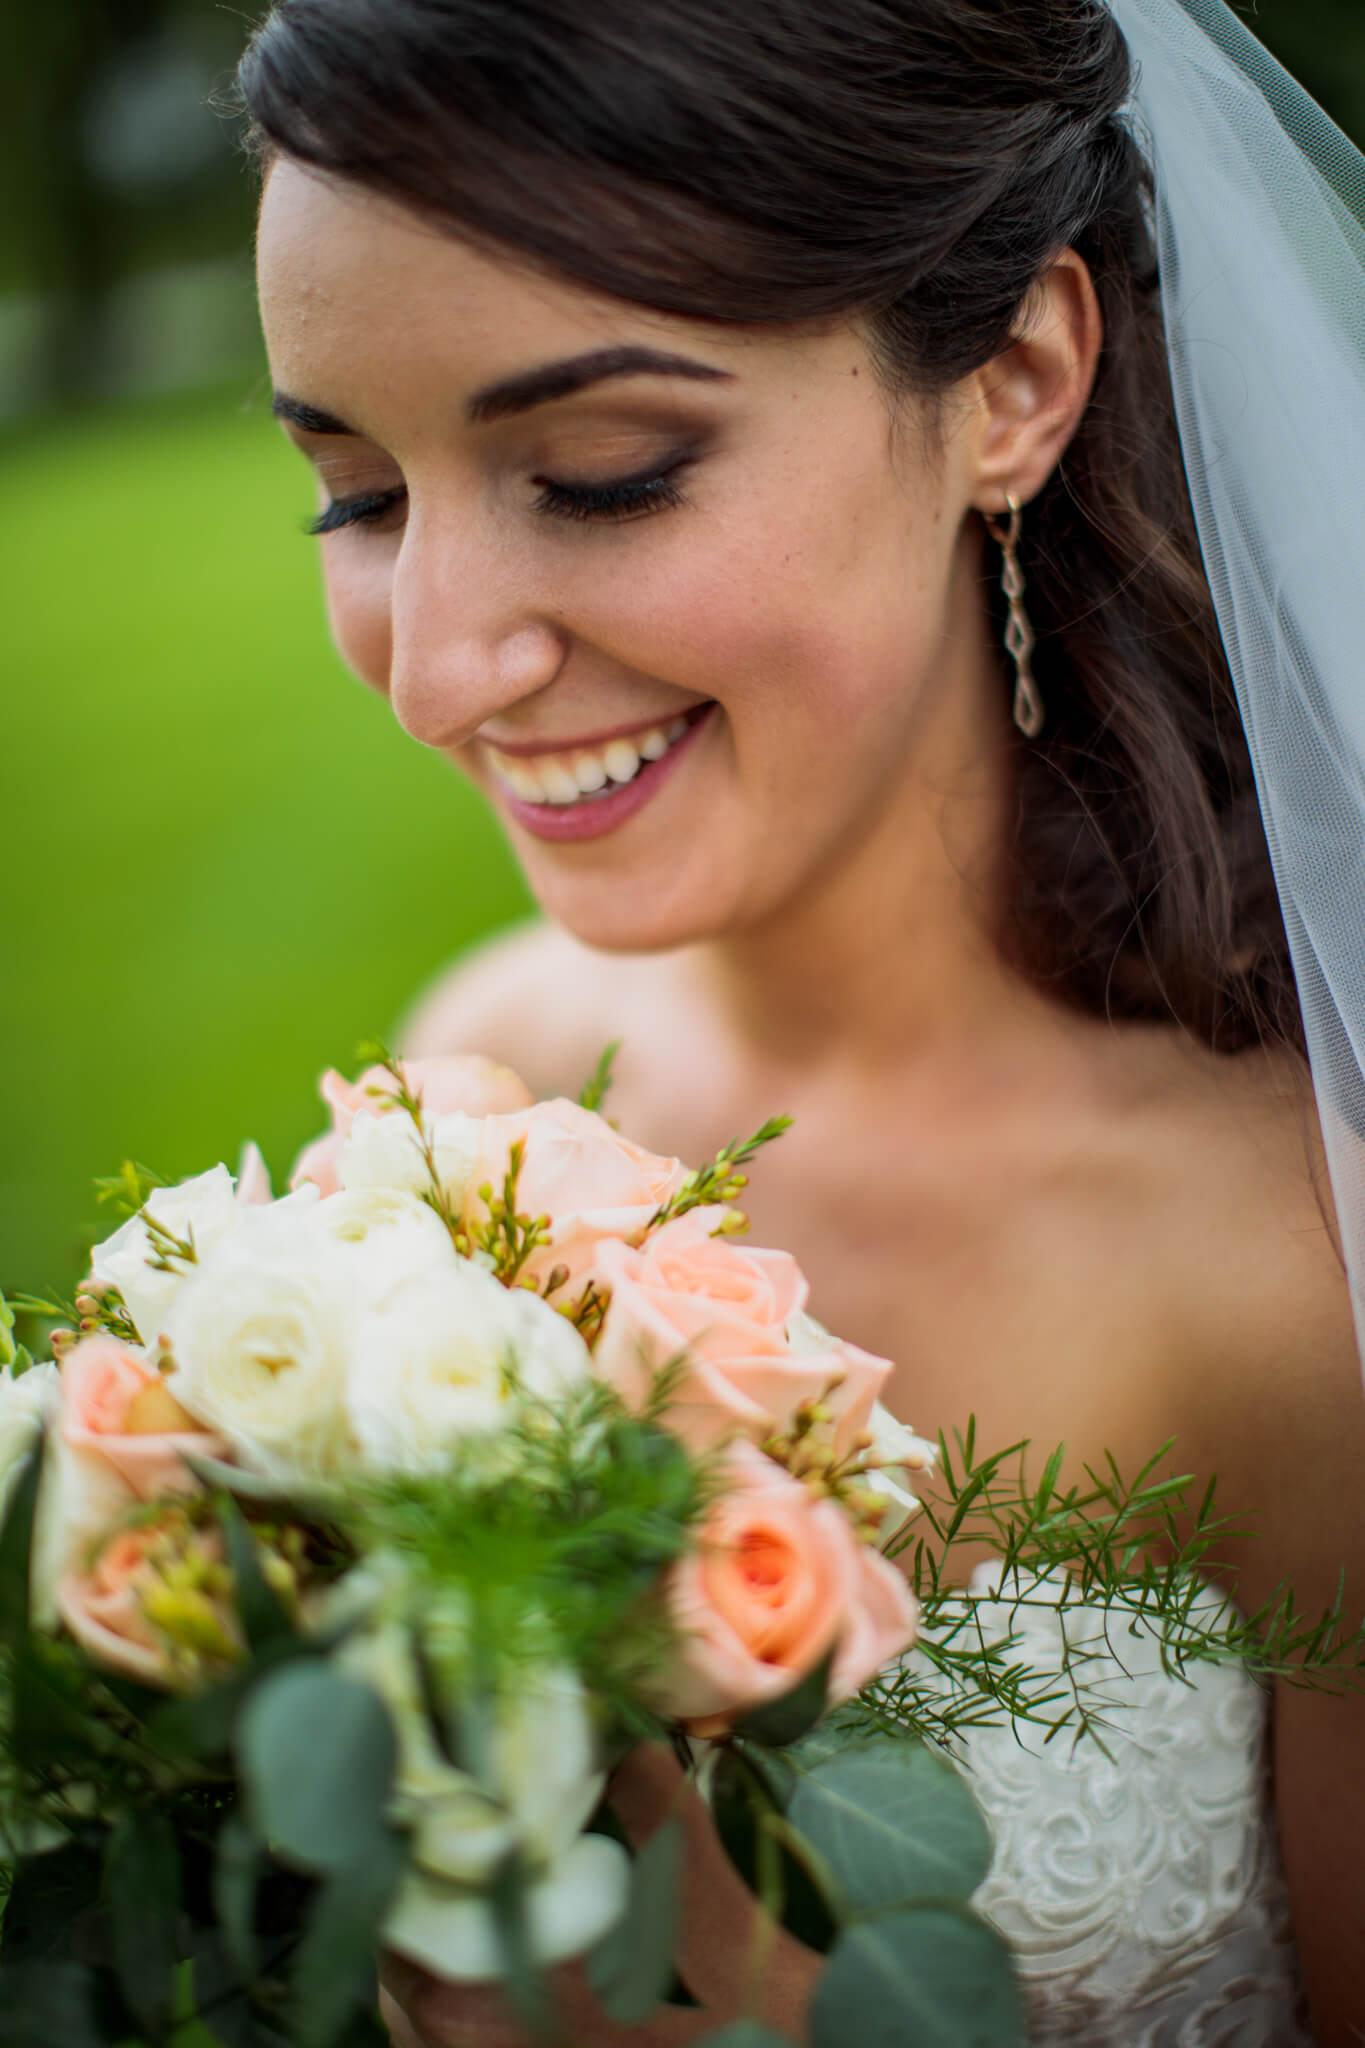 Alysia Jerad Homestead Blessings Farm Hershey PA Wedding Rustic Chique - 64.JPG